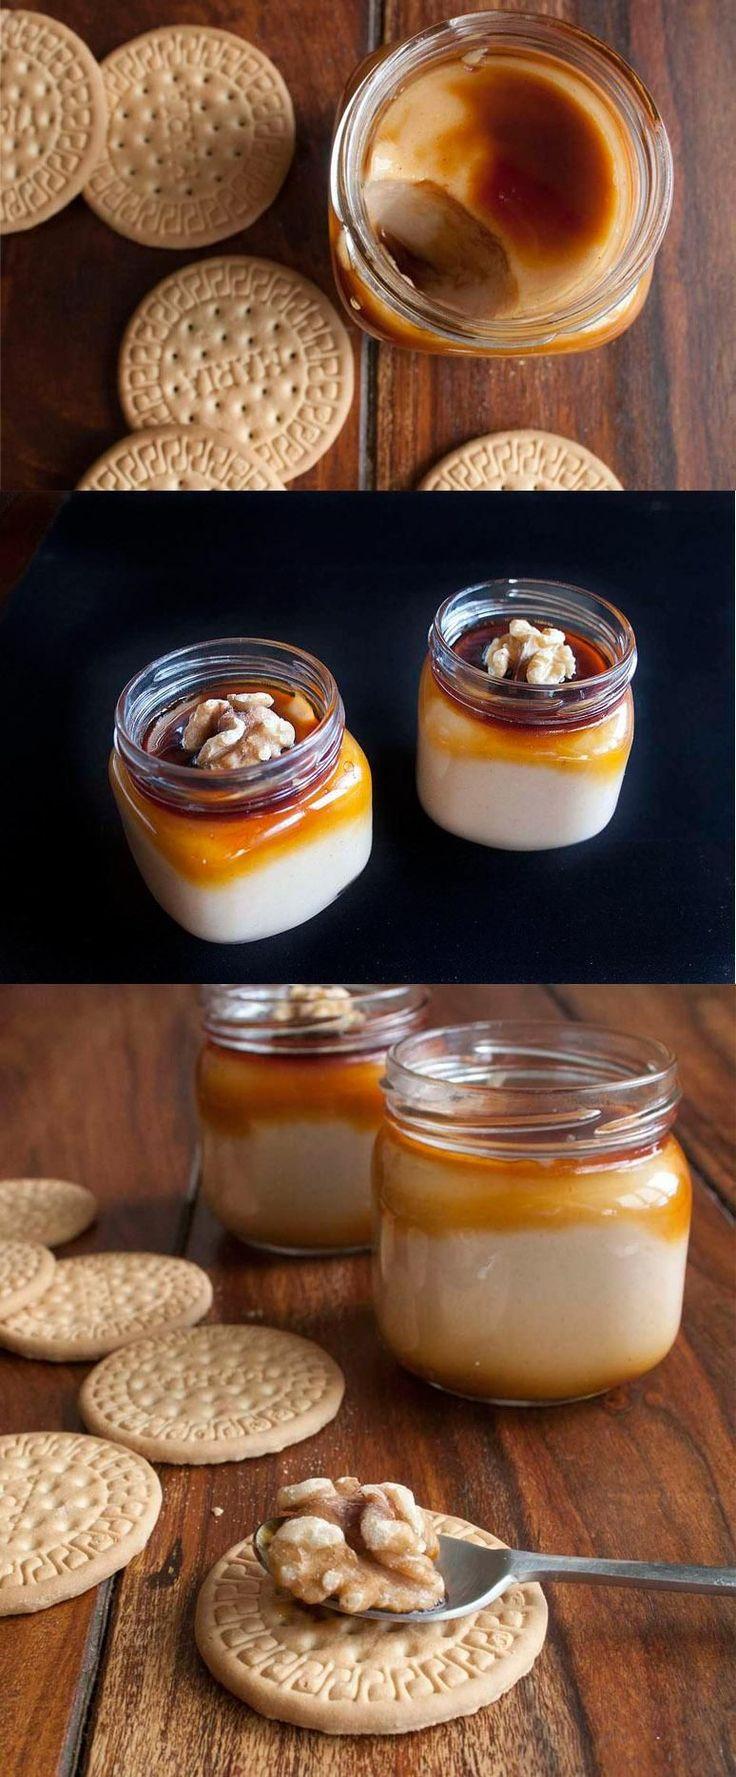 crema-galletas-pecados-reposteria-1